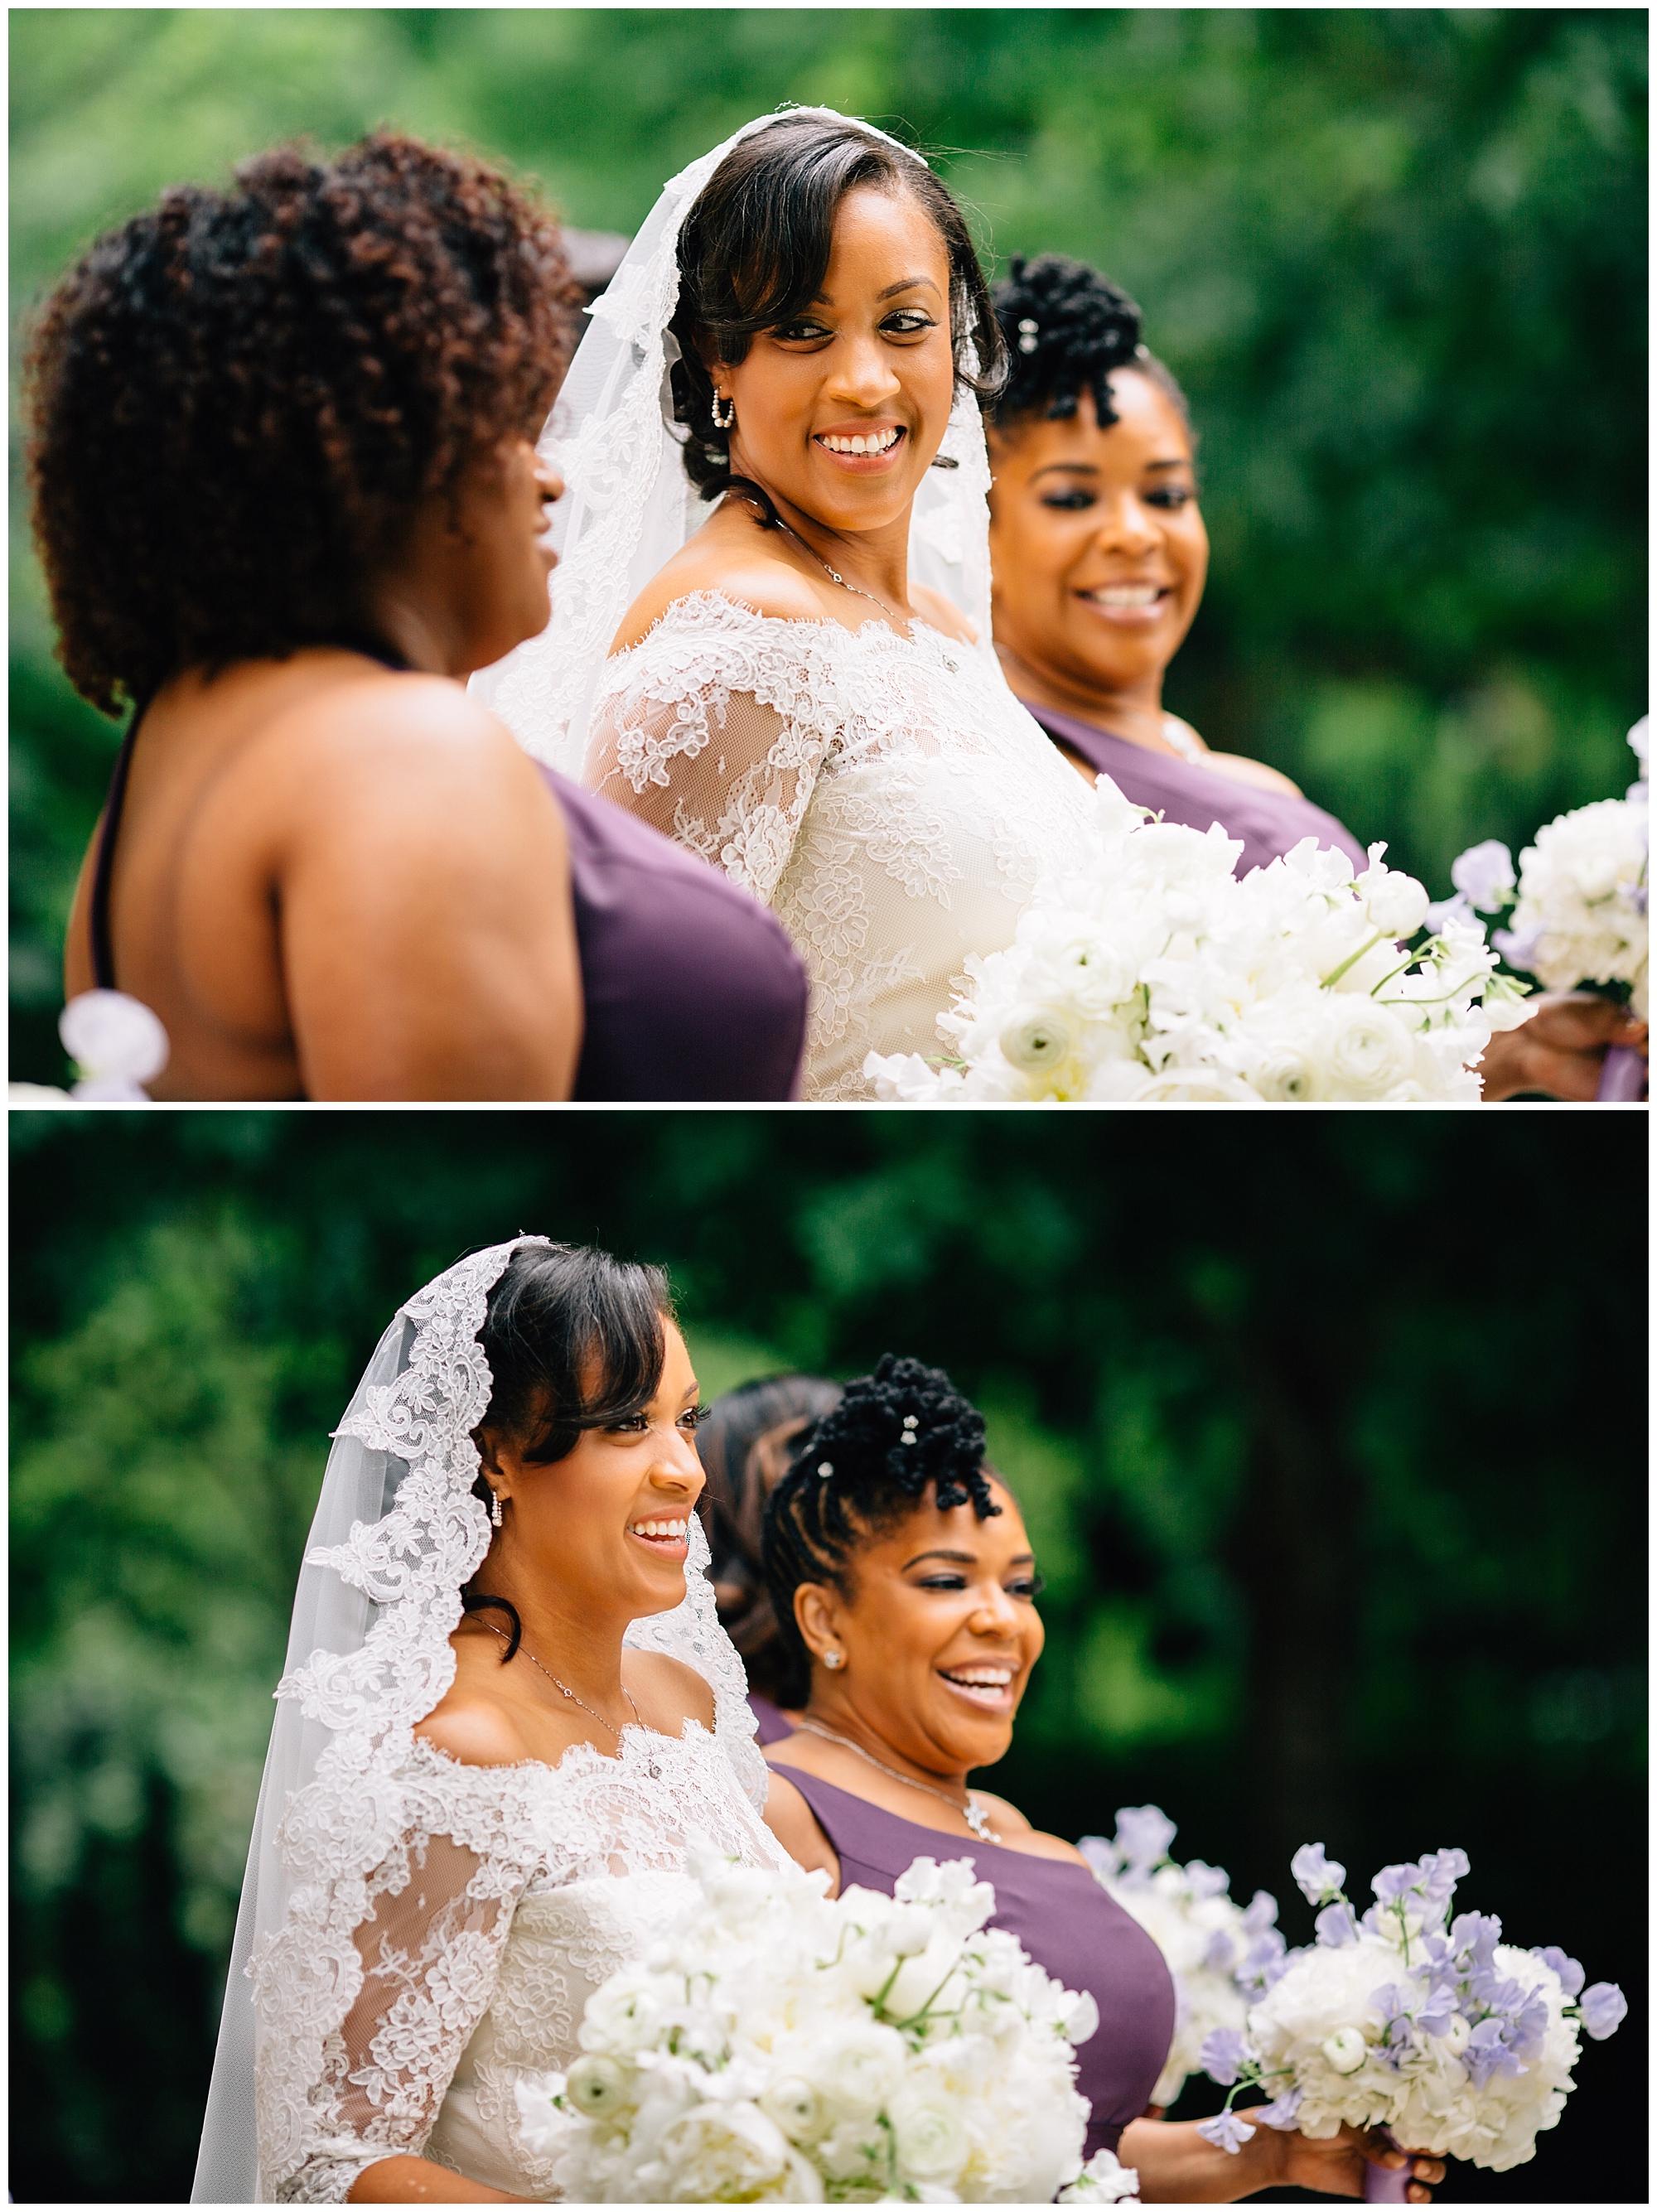 Umstead-wedding-photographer_0028.jpg